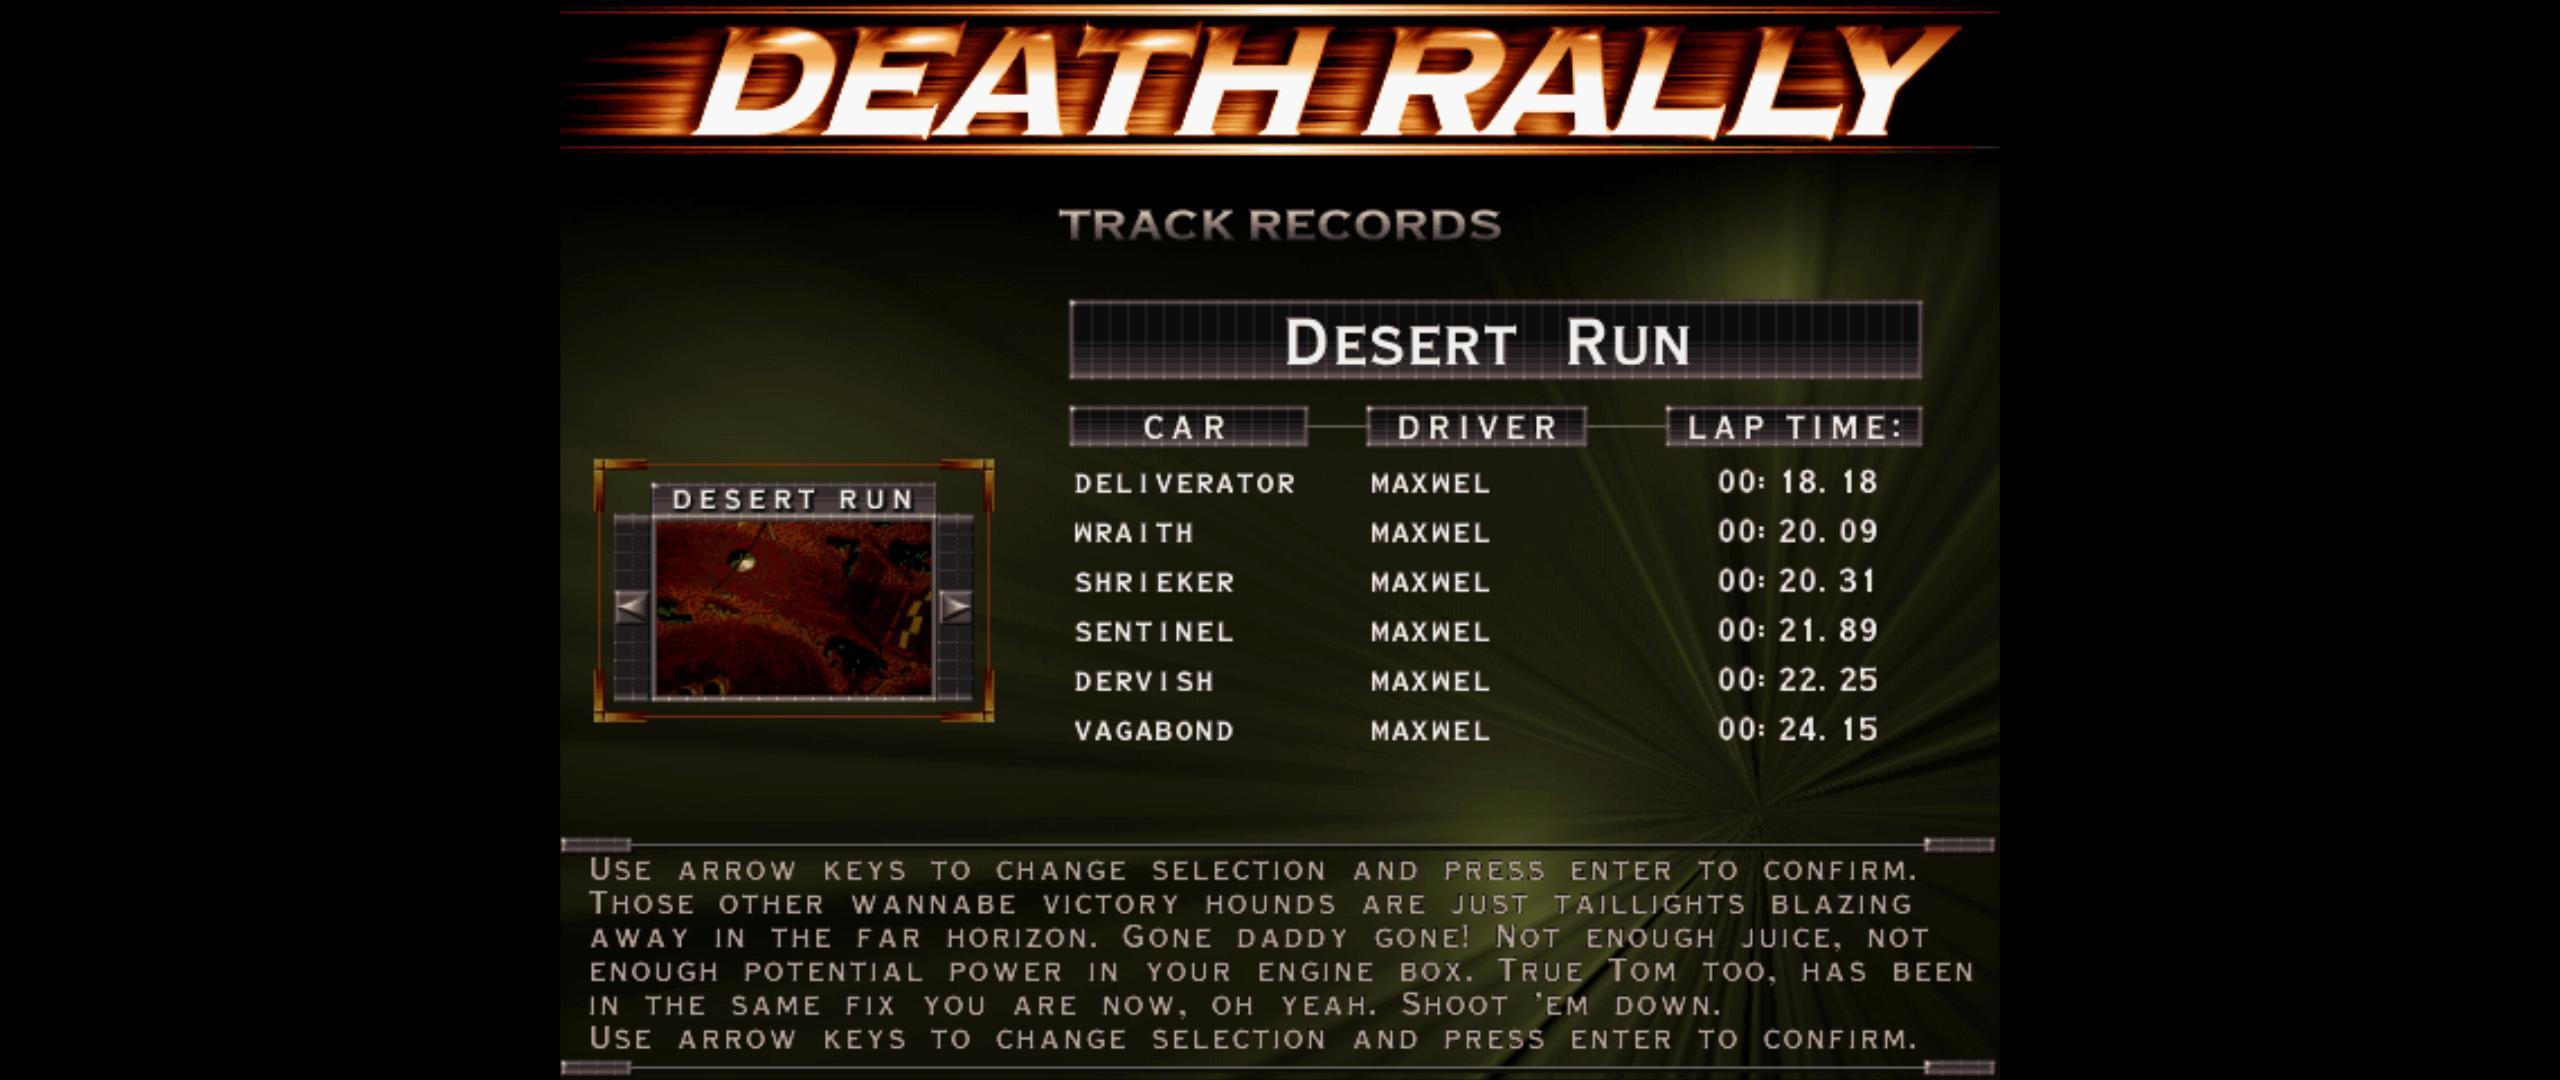 Maxwel: Death Rally [Desert Run, Dervish Car Car] (PC) 0:00:22.25 points on 2016-03-04 06:57:23